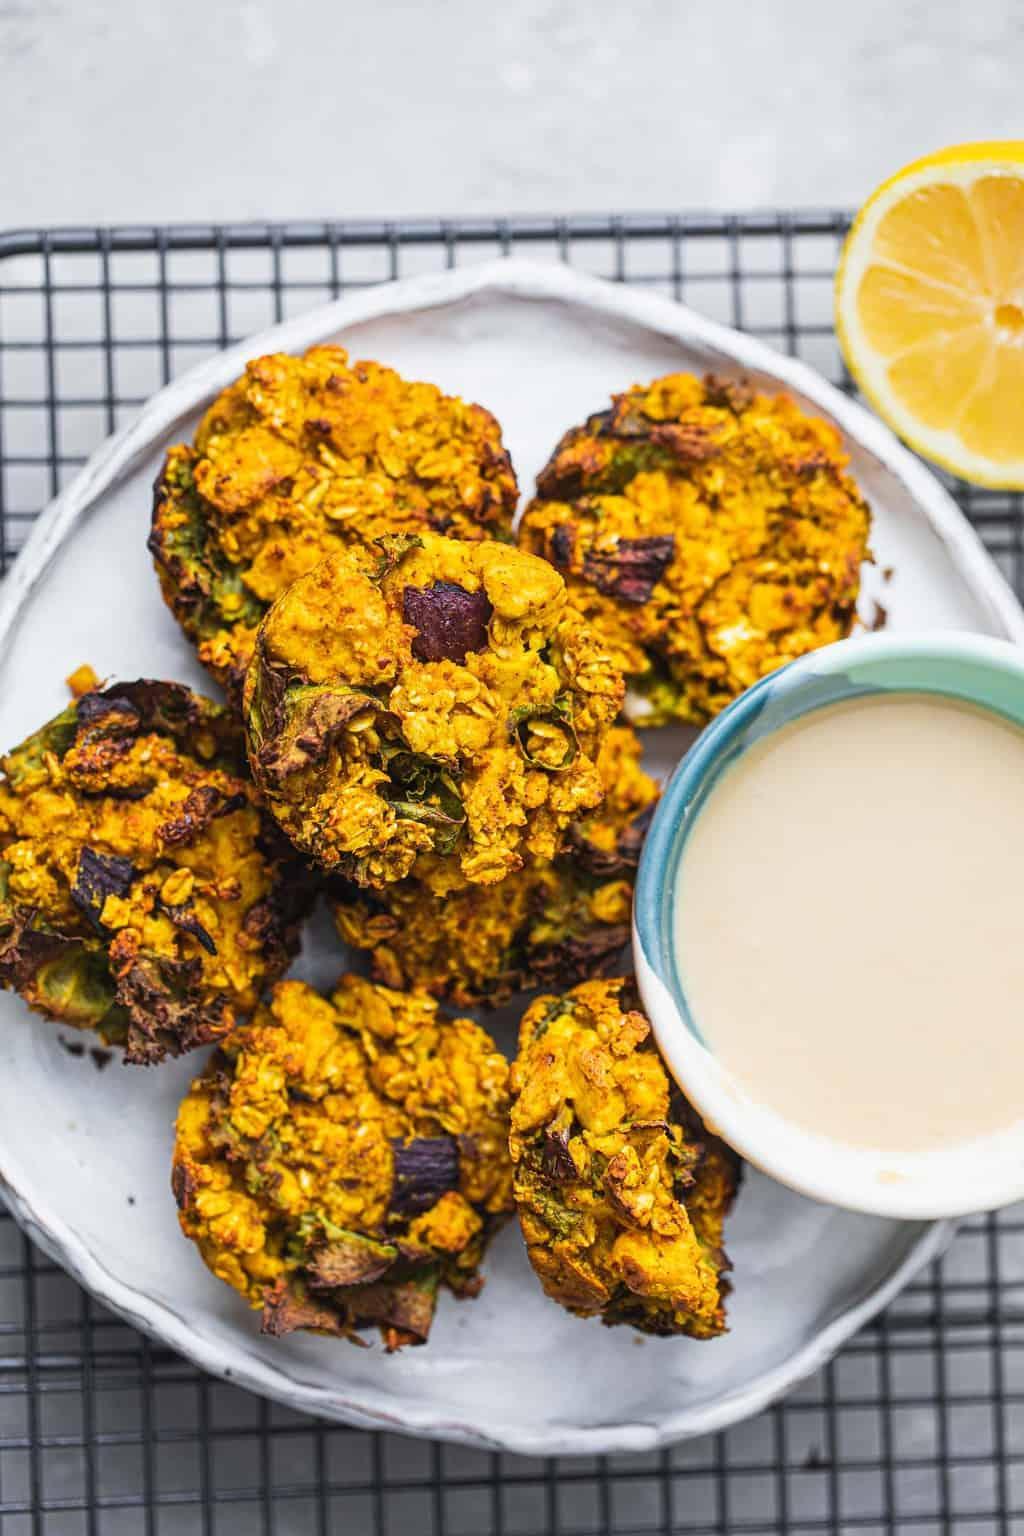 Oat and tofu vegan 'egg' muffinns